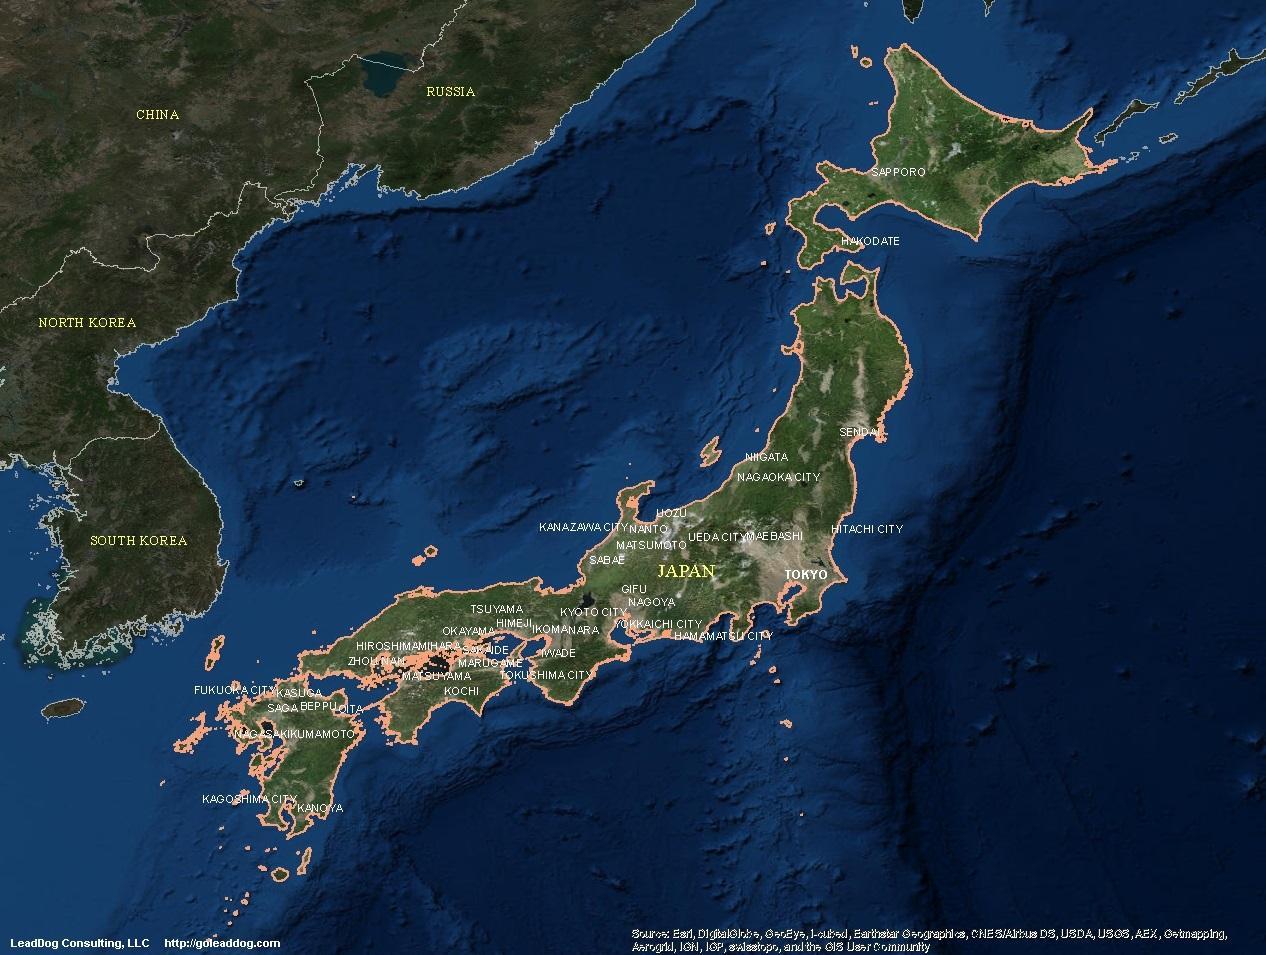 Cartina Geografica Satellitare.Giappone Mappa Satellitare Mappa Satellitare Del Giappone Asia Orientale Asia